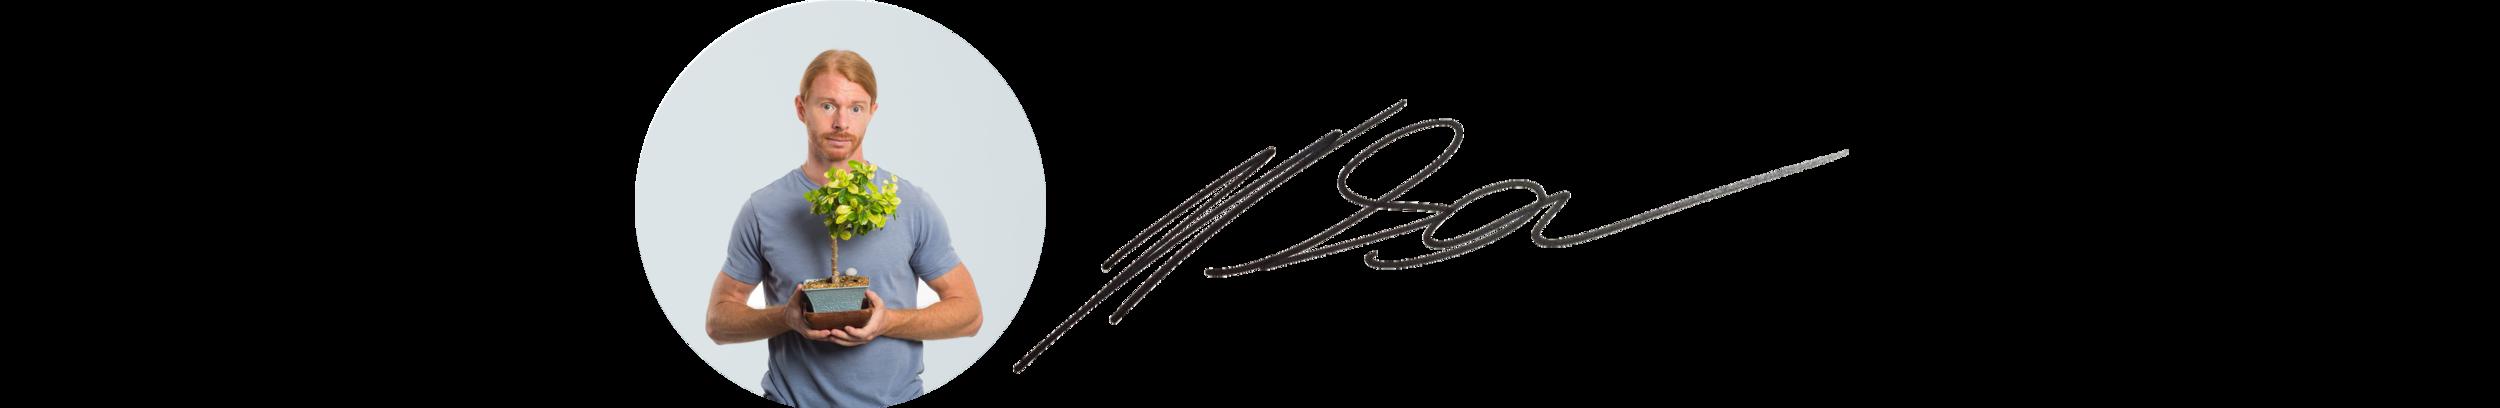 JP Sears signature - intercom.png